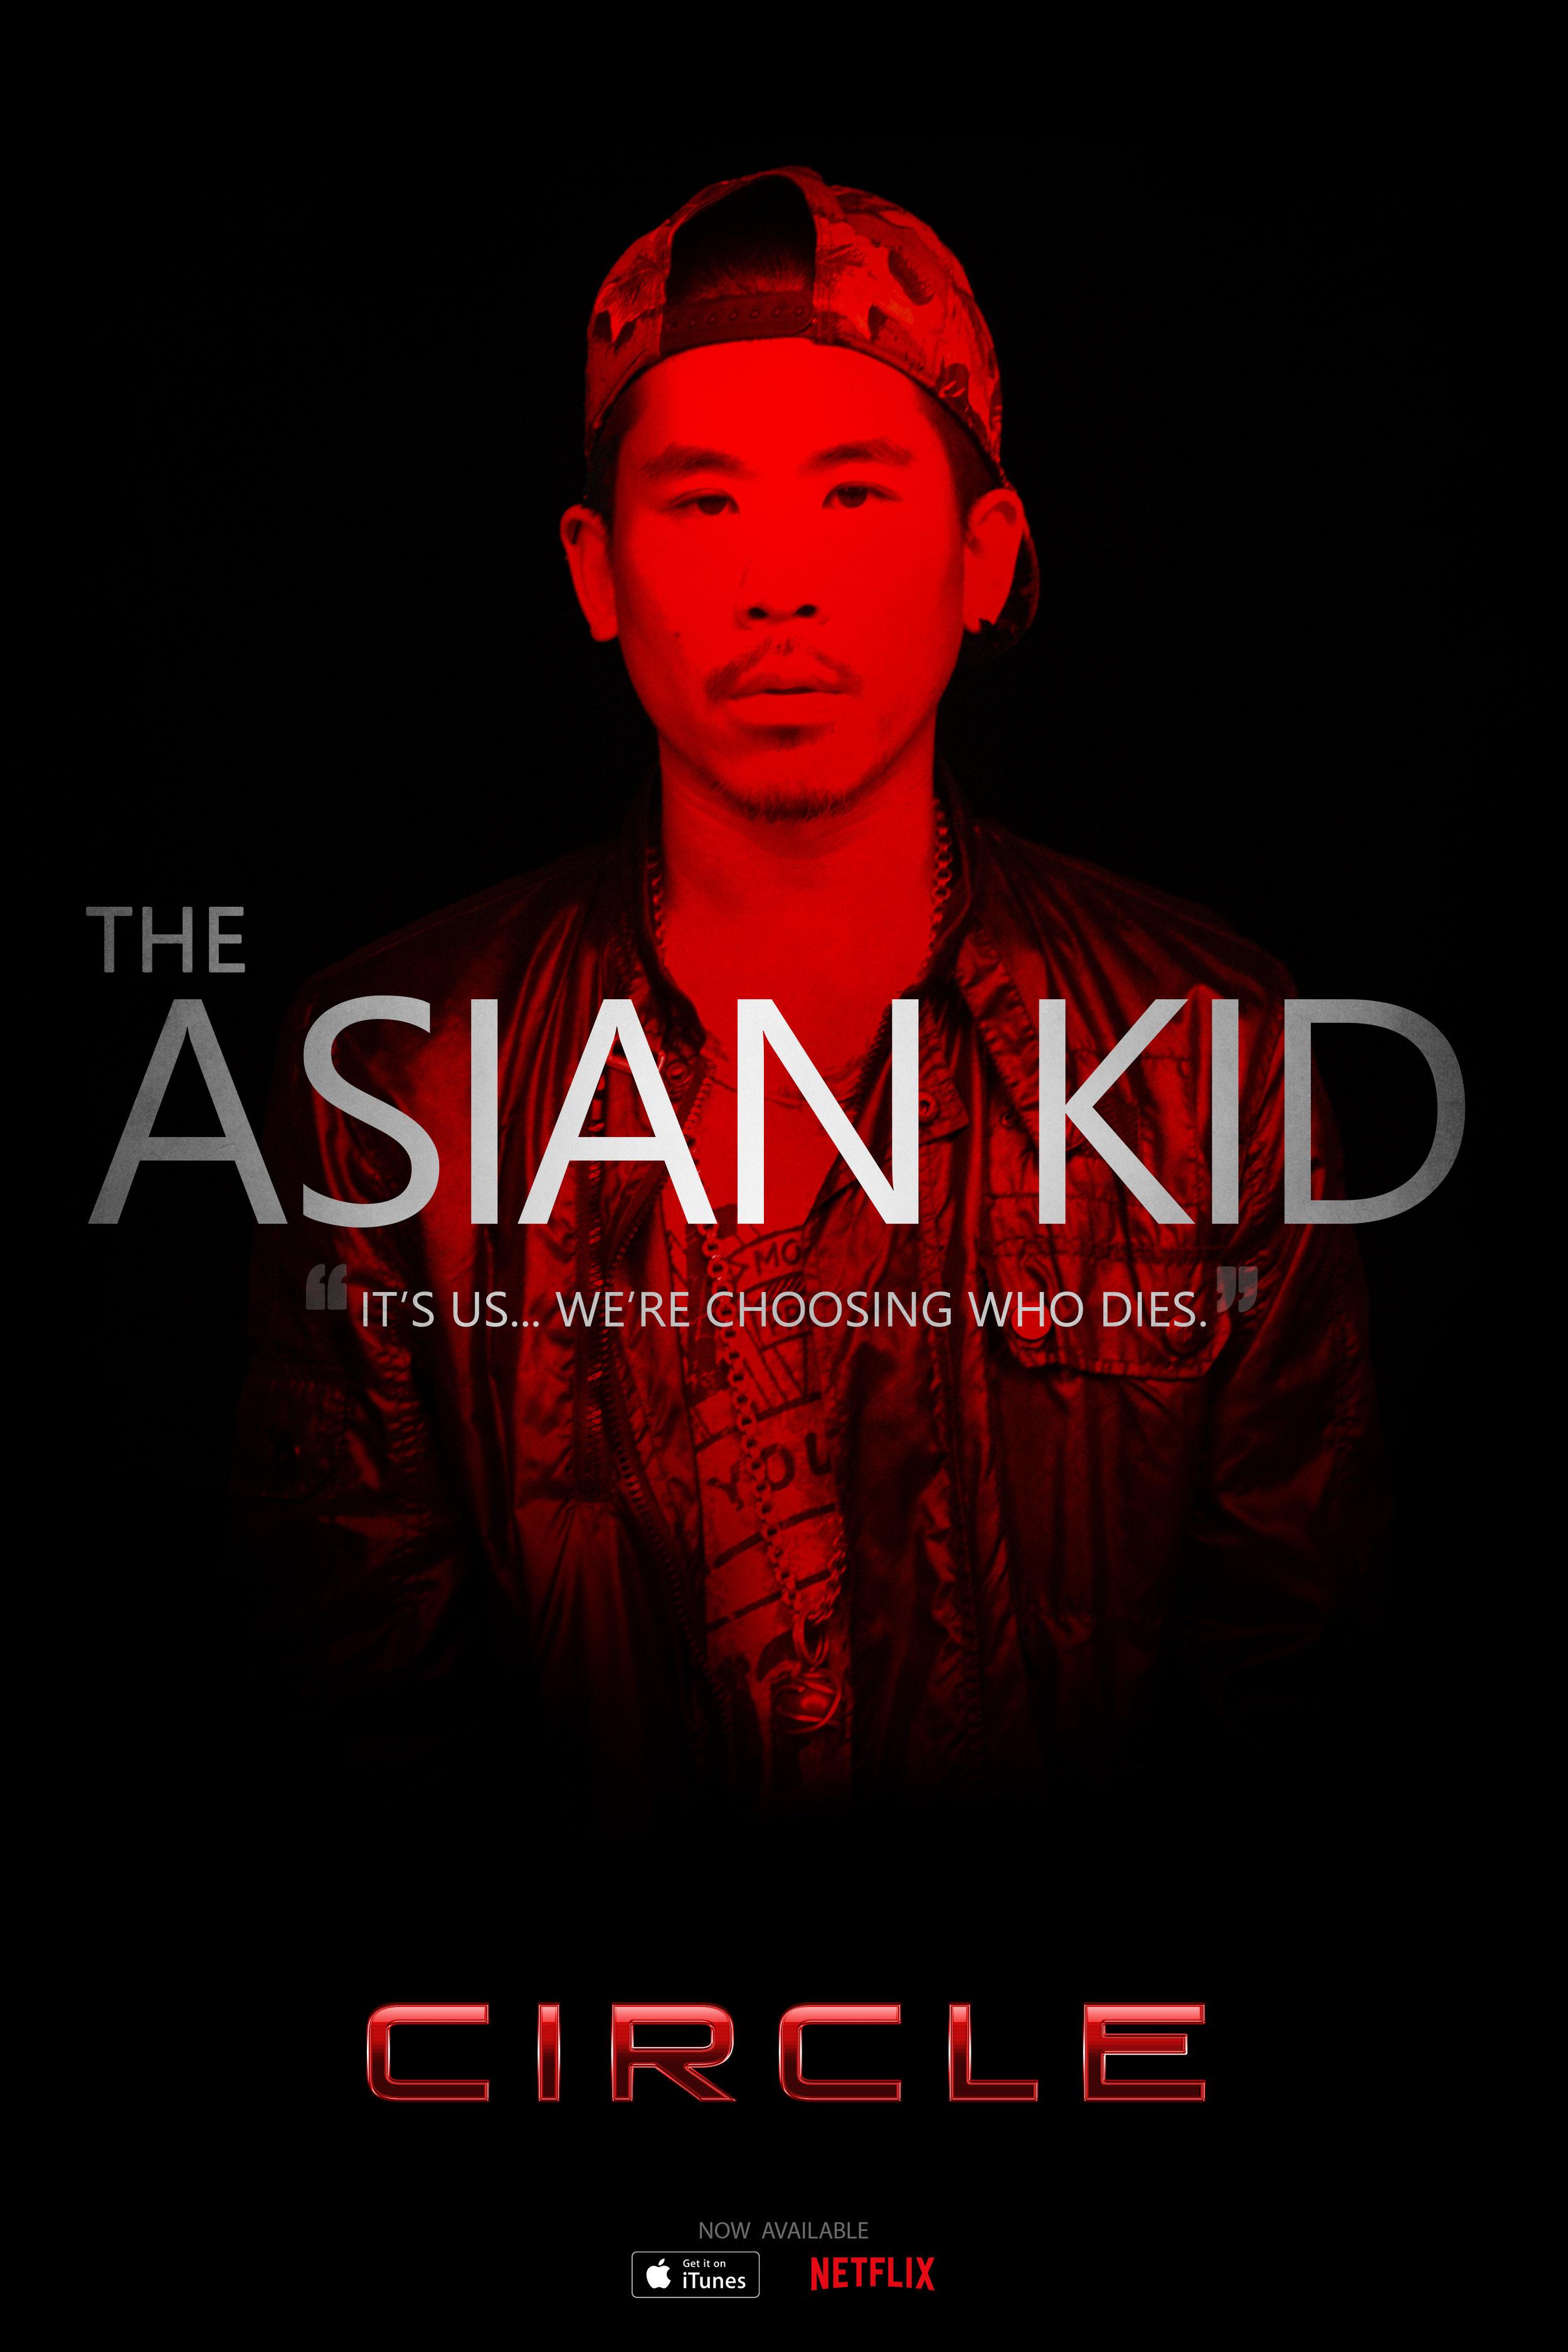 Asian Kid Jpeg.jpg